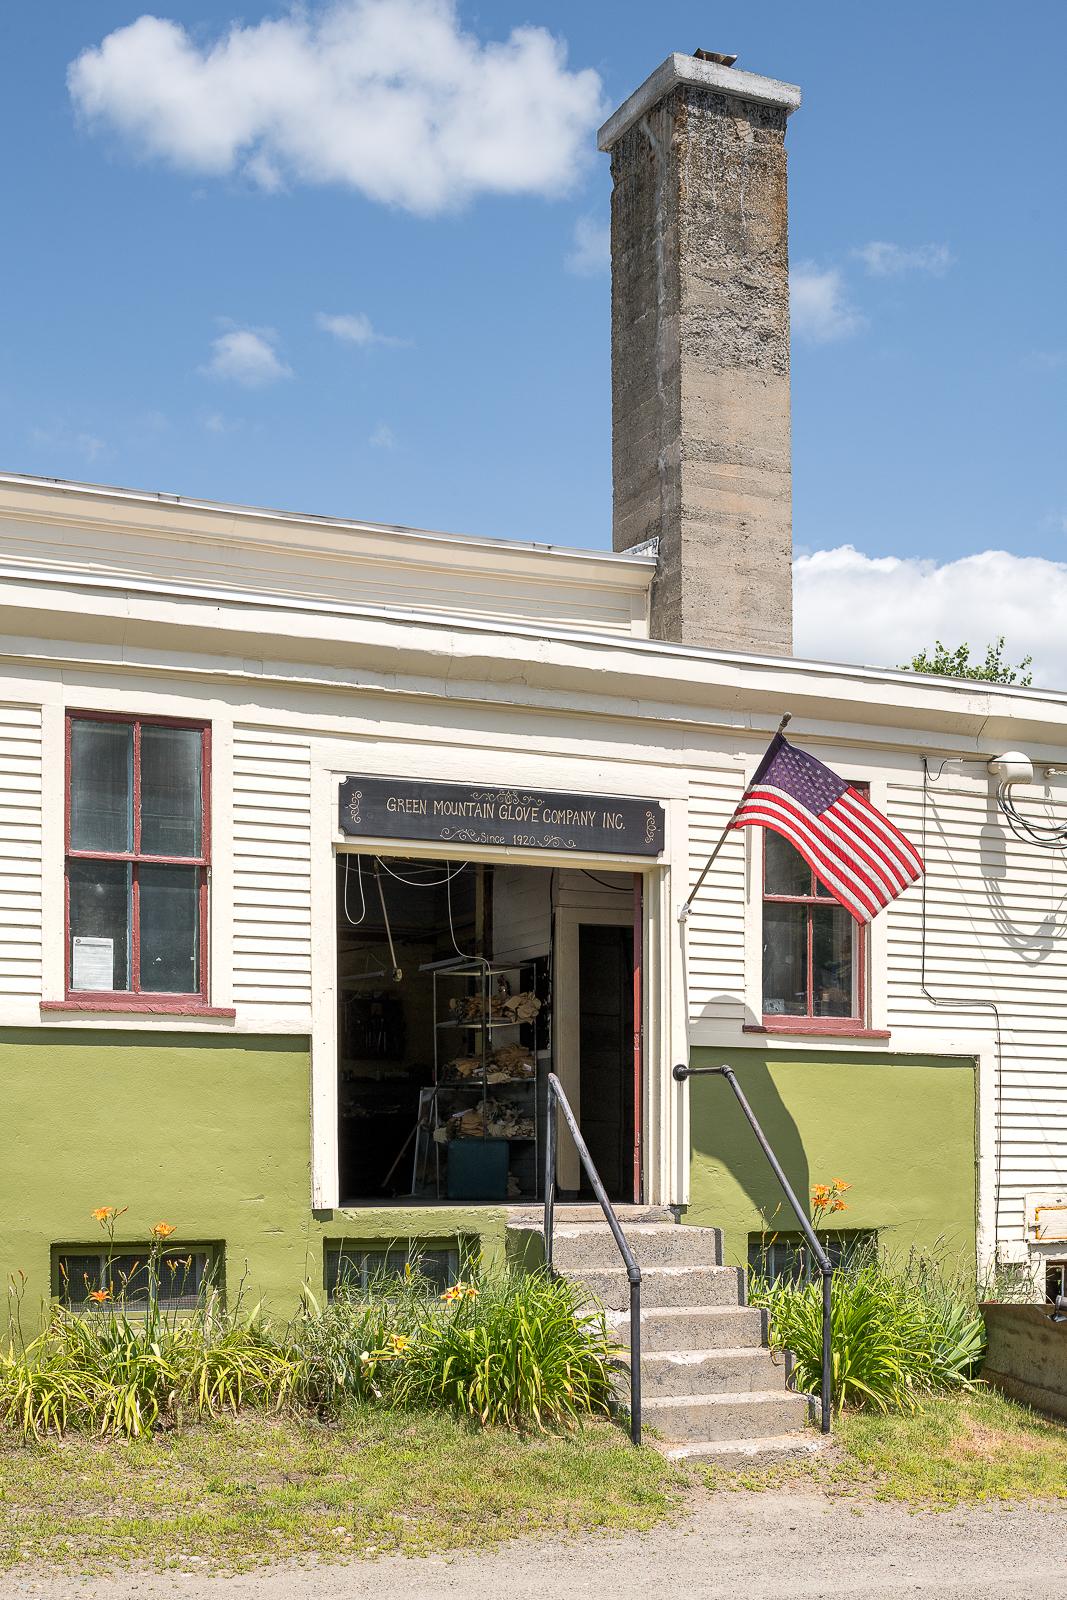 Front Entrance still bares the original Green Mountain Glove Company sign.